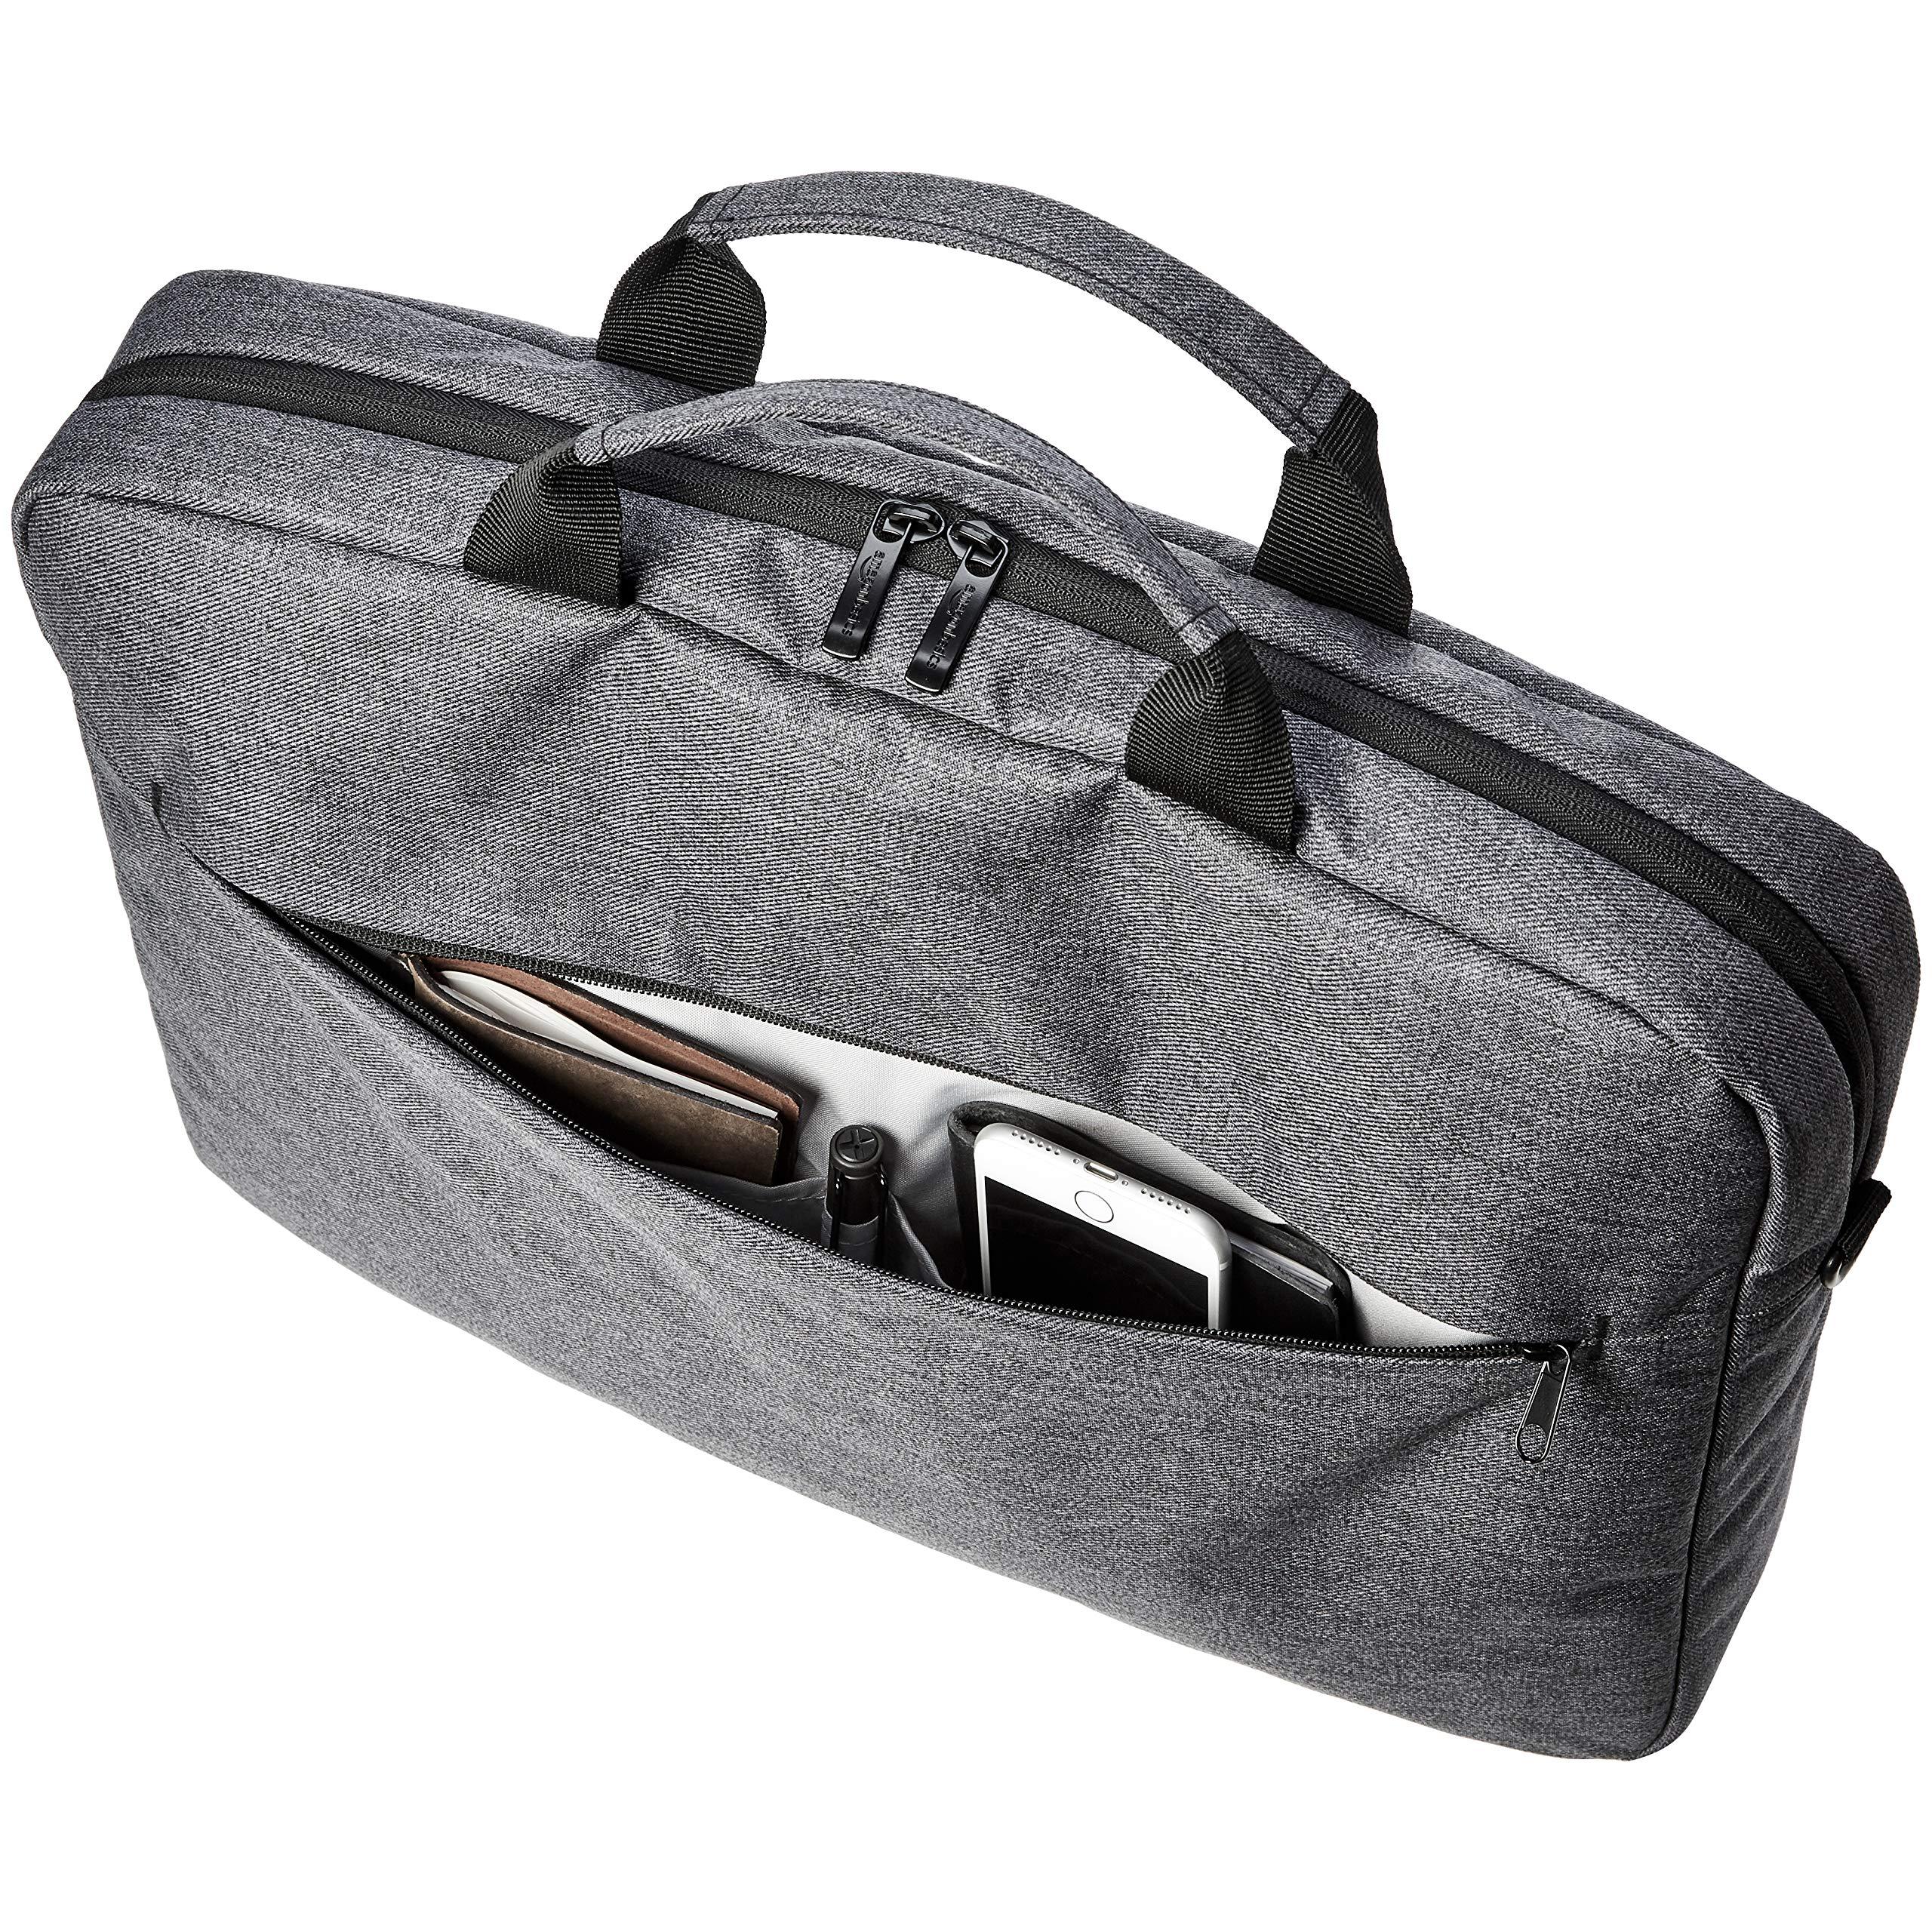 AmazonBasics Urban Laptop and Tablet Case Bag, 17 Inch, Grey by AmazonBasics (Image #5)